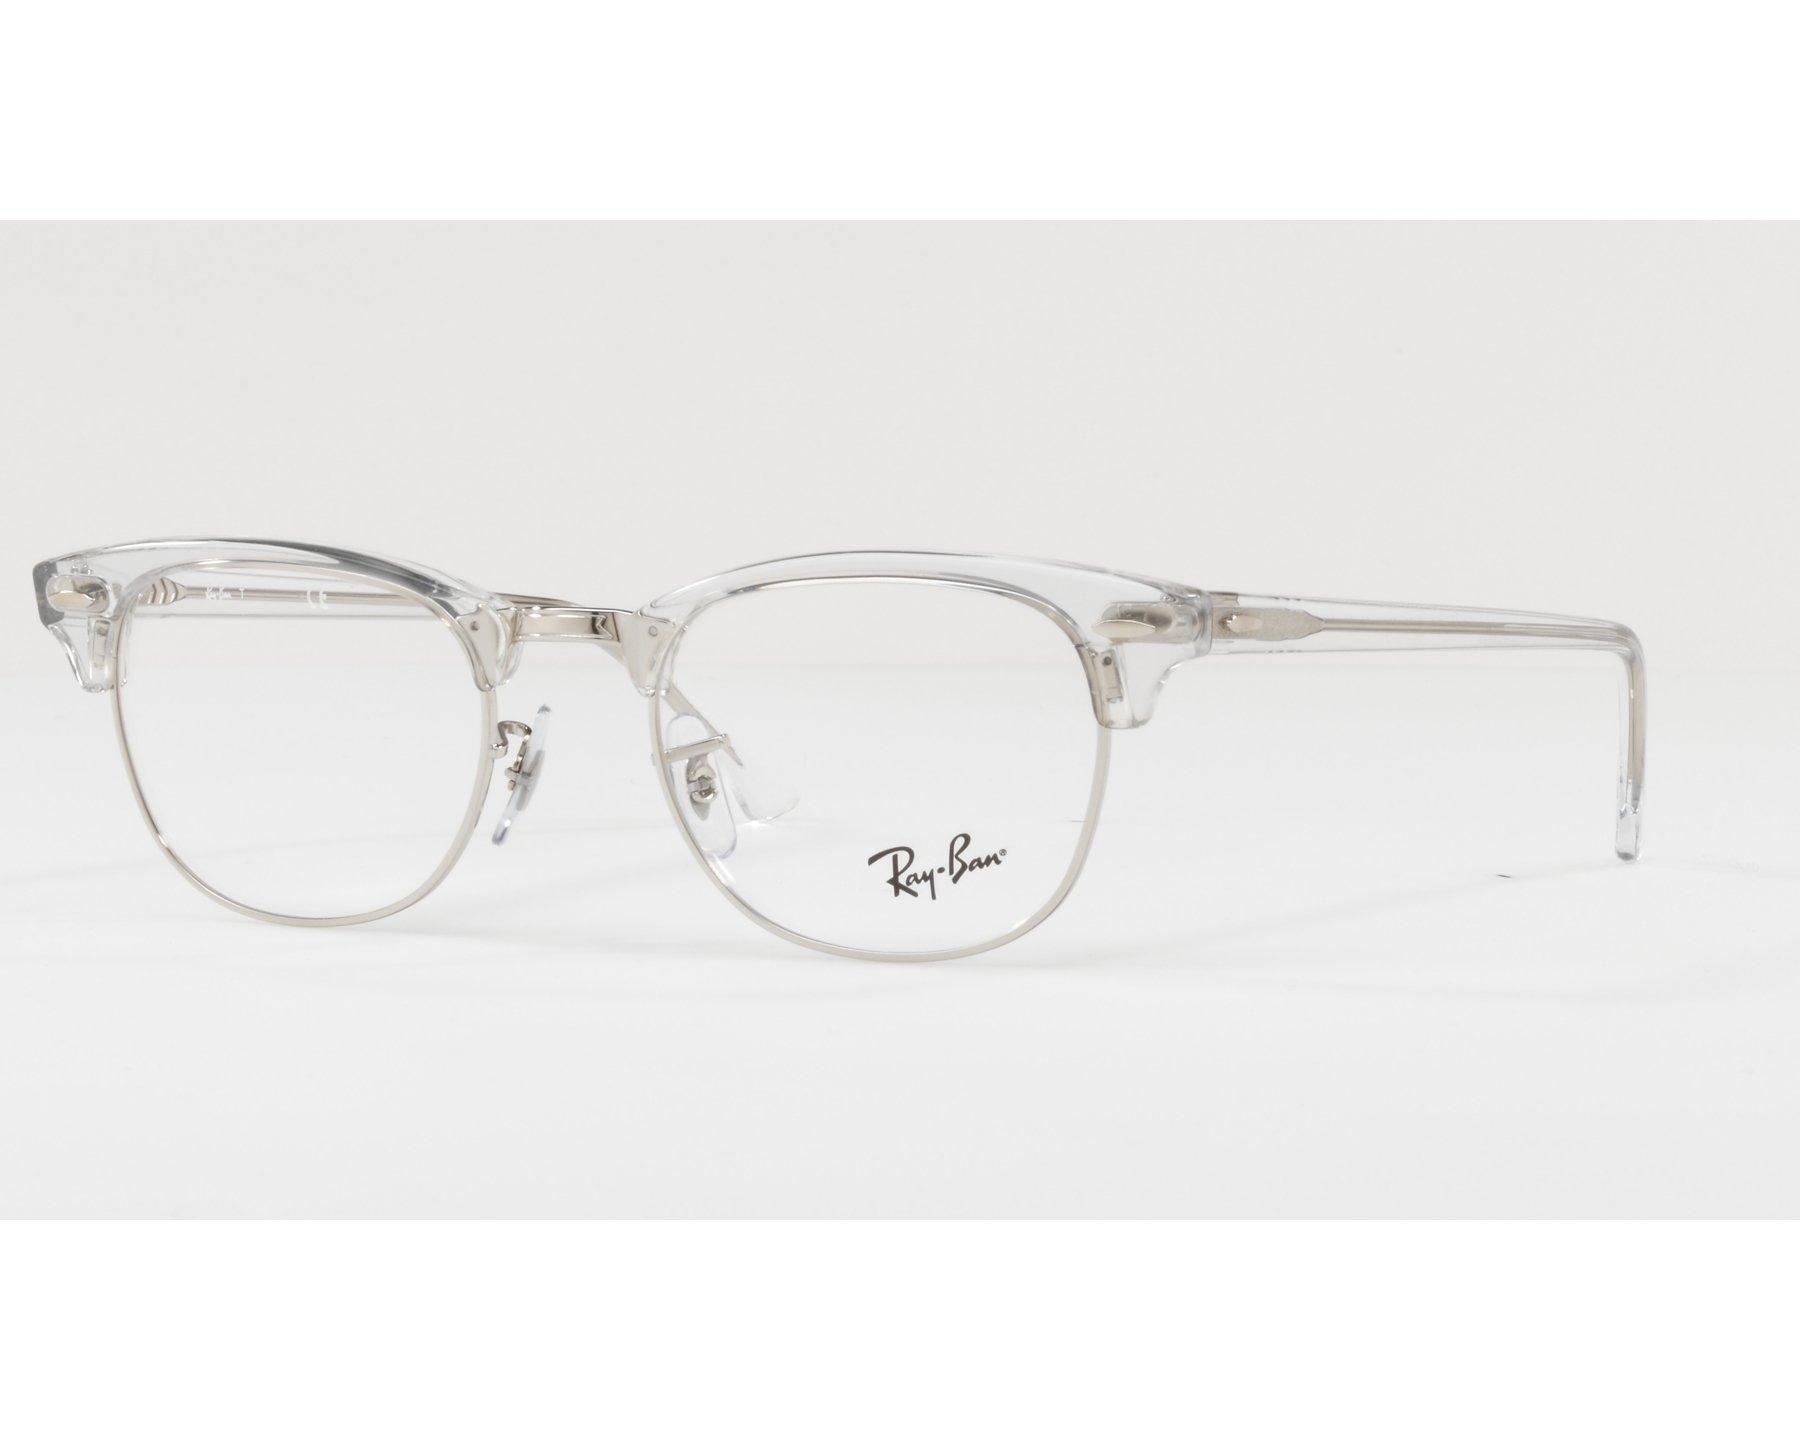 acb77ad064c eyeglasses Ray-Ban RX-5154 2001 49-21 Crystal Silver